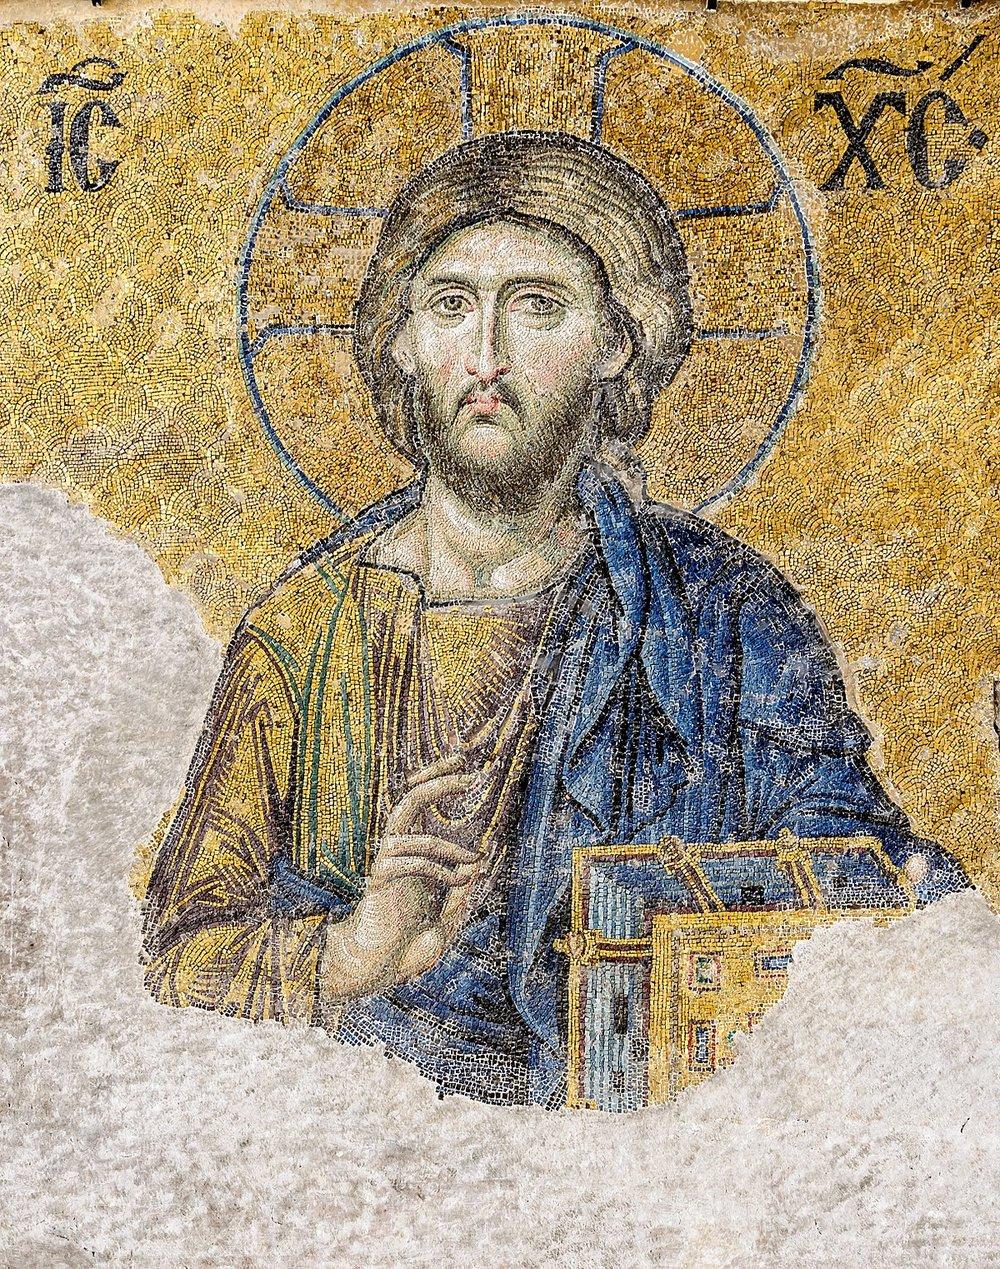 1200px-Christ_Pantocrator_Deesis_mosaic_Hagia_Sophia.jpg